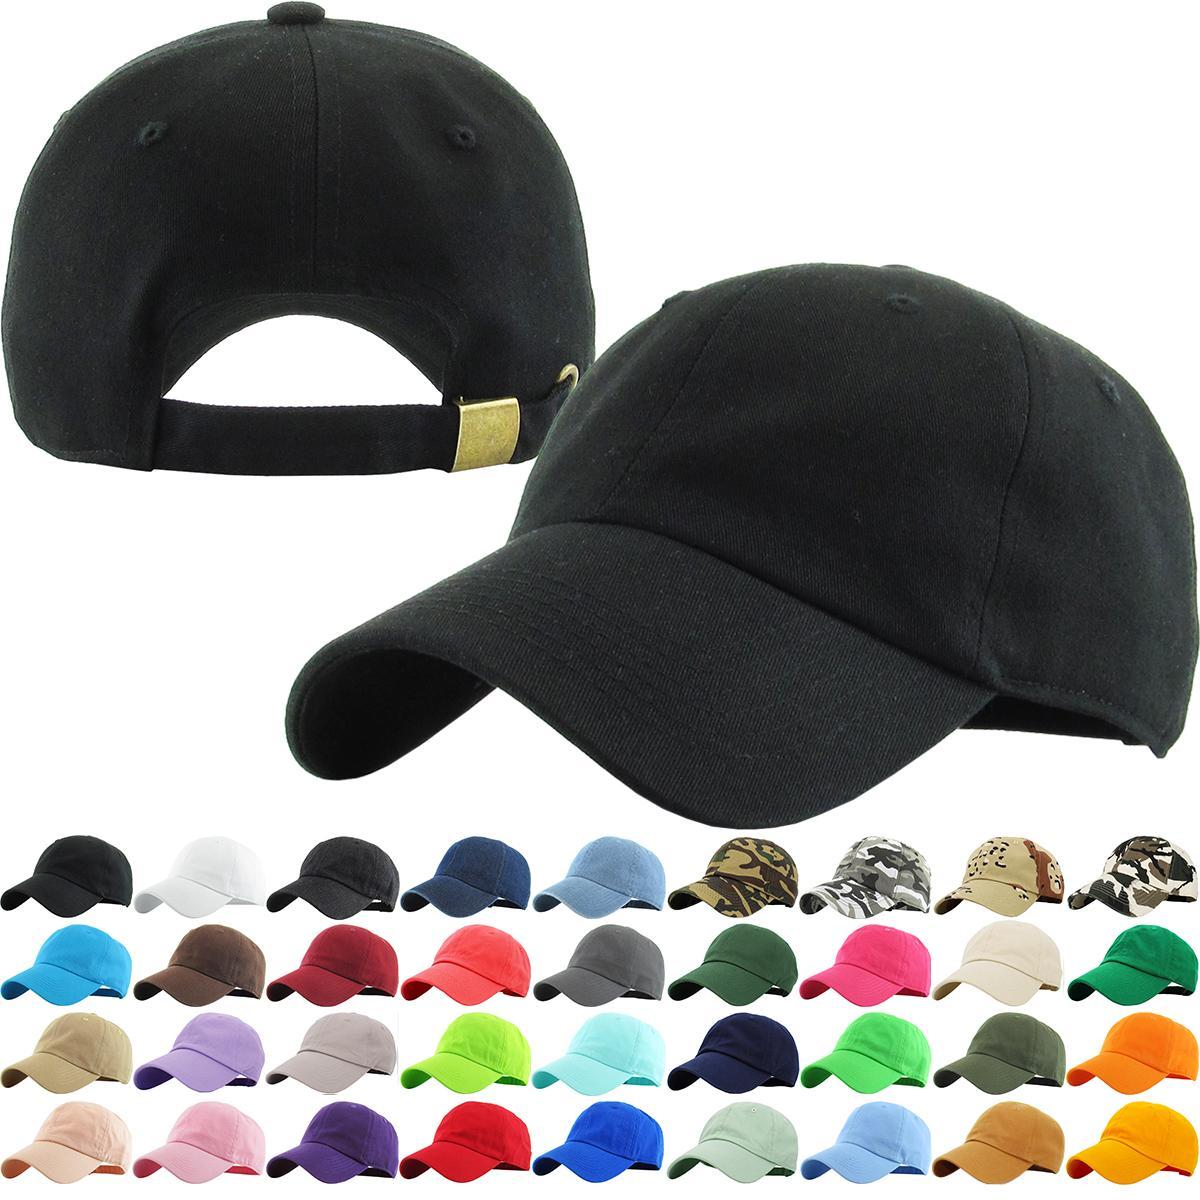 GWHOLE Classic Cotton Plain Basic Baseball Cap Black